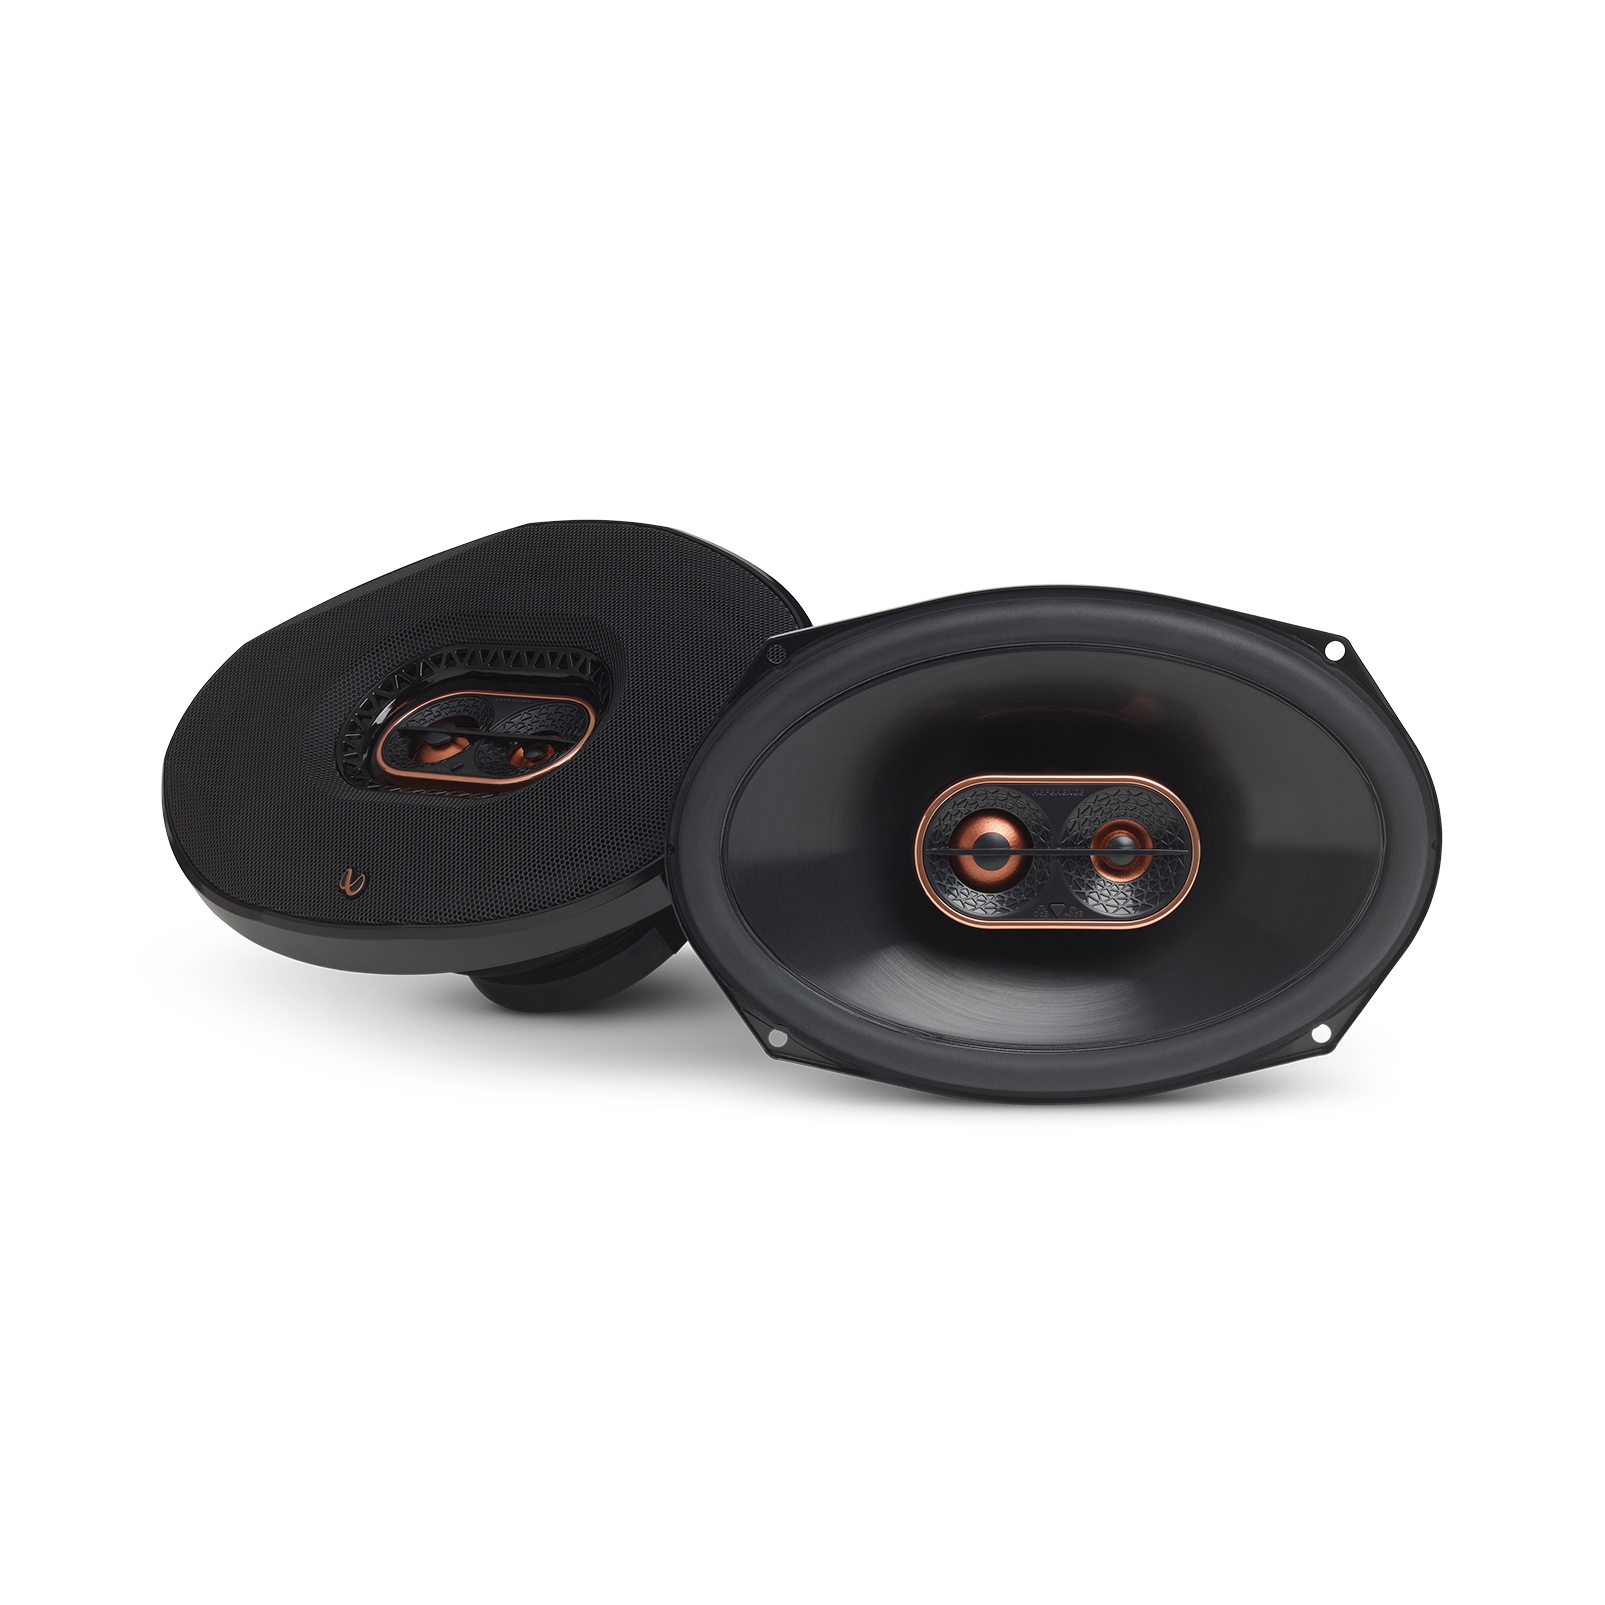 "Reference 9633ix - Black - 6"" x 9"" (152mm x 230mm) 3-way car speaker, 300W - Hero"